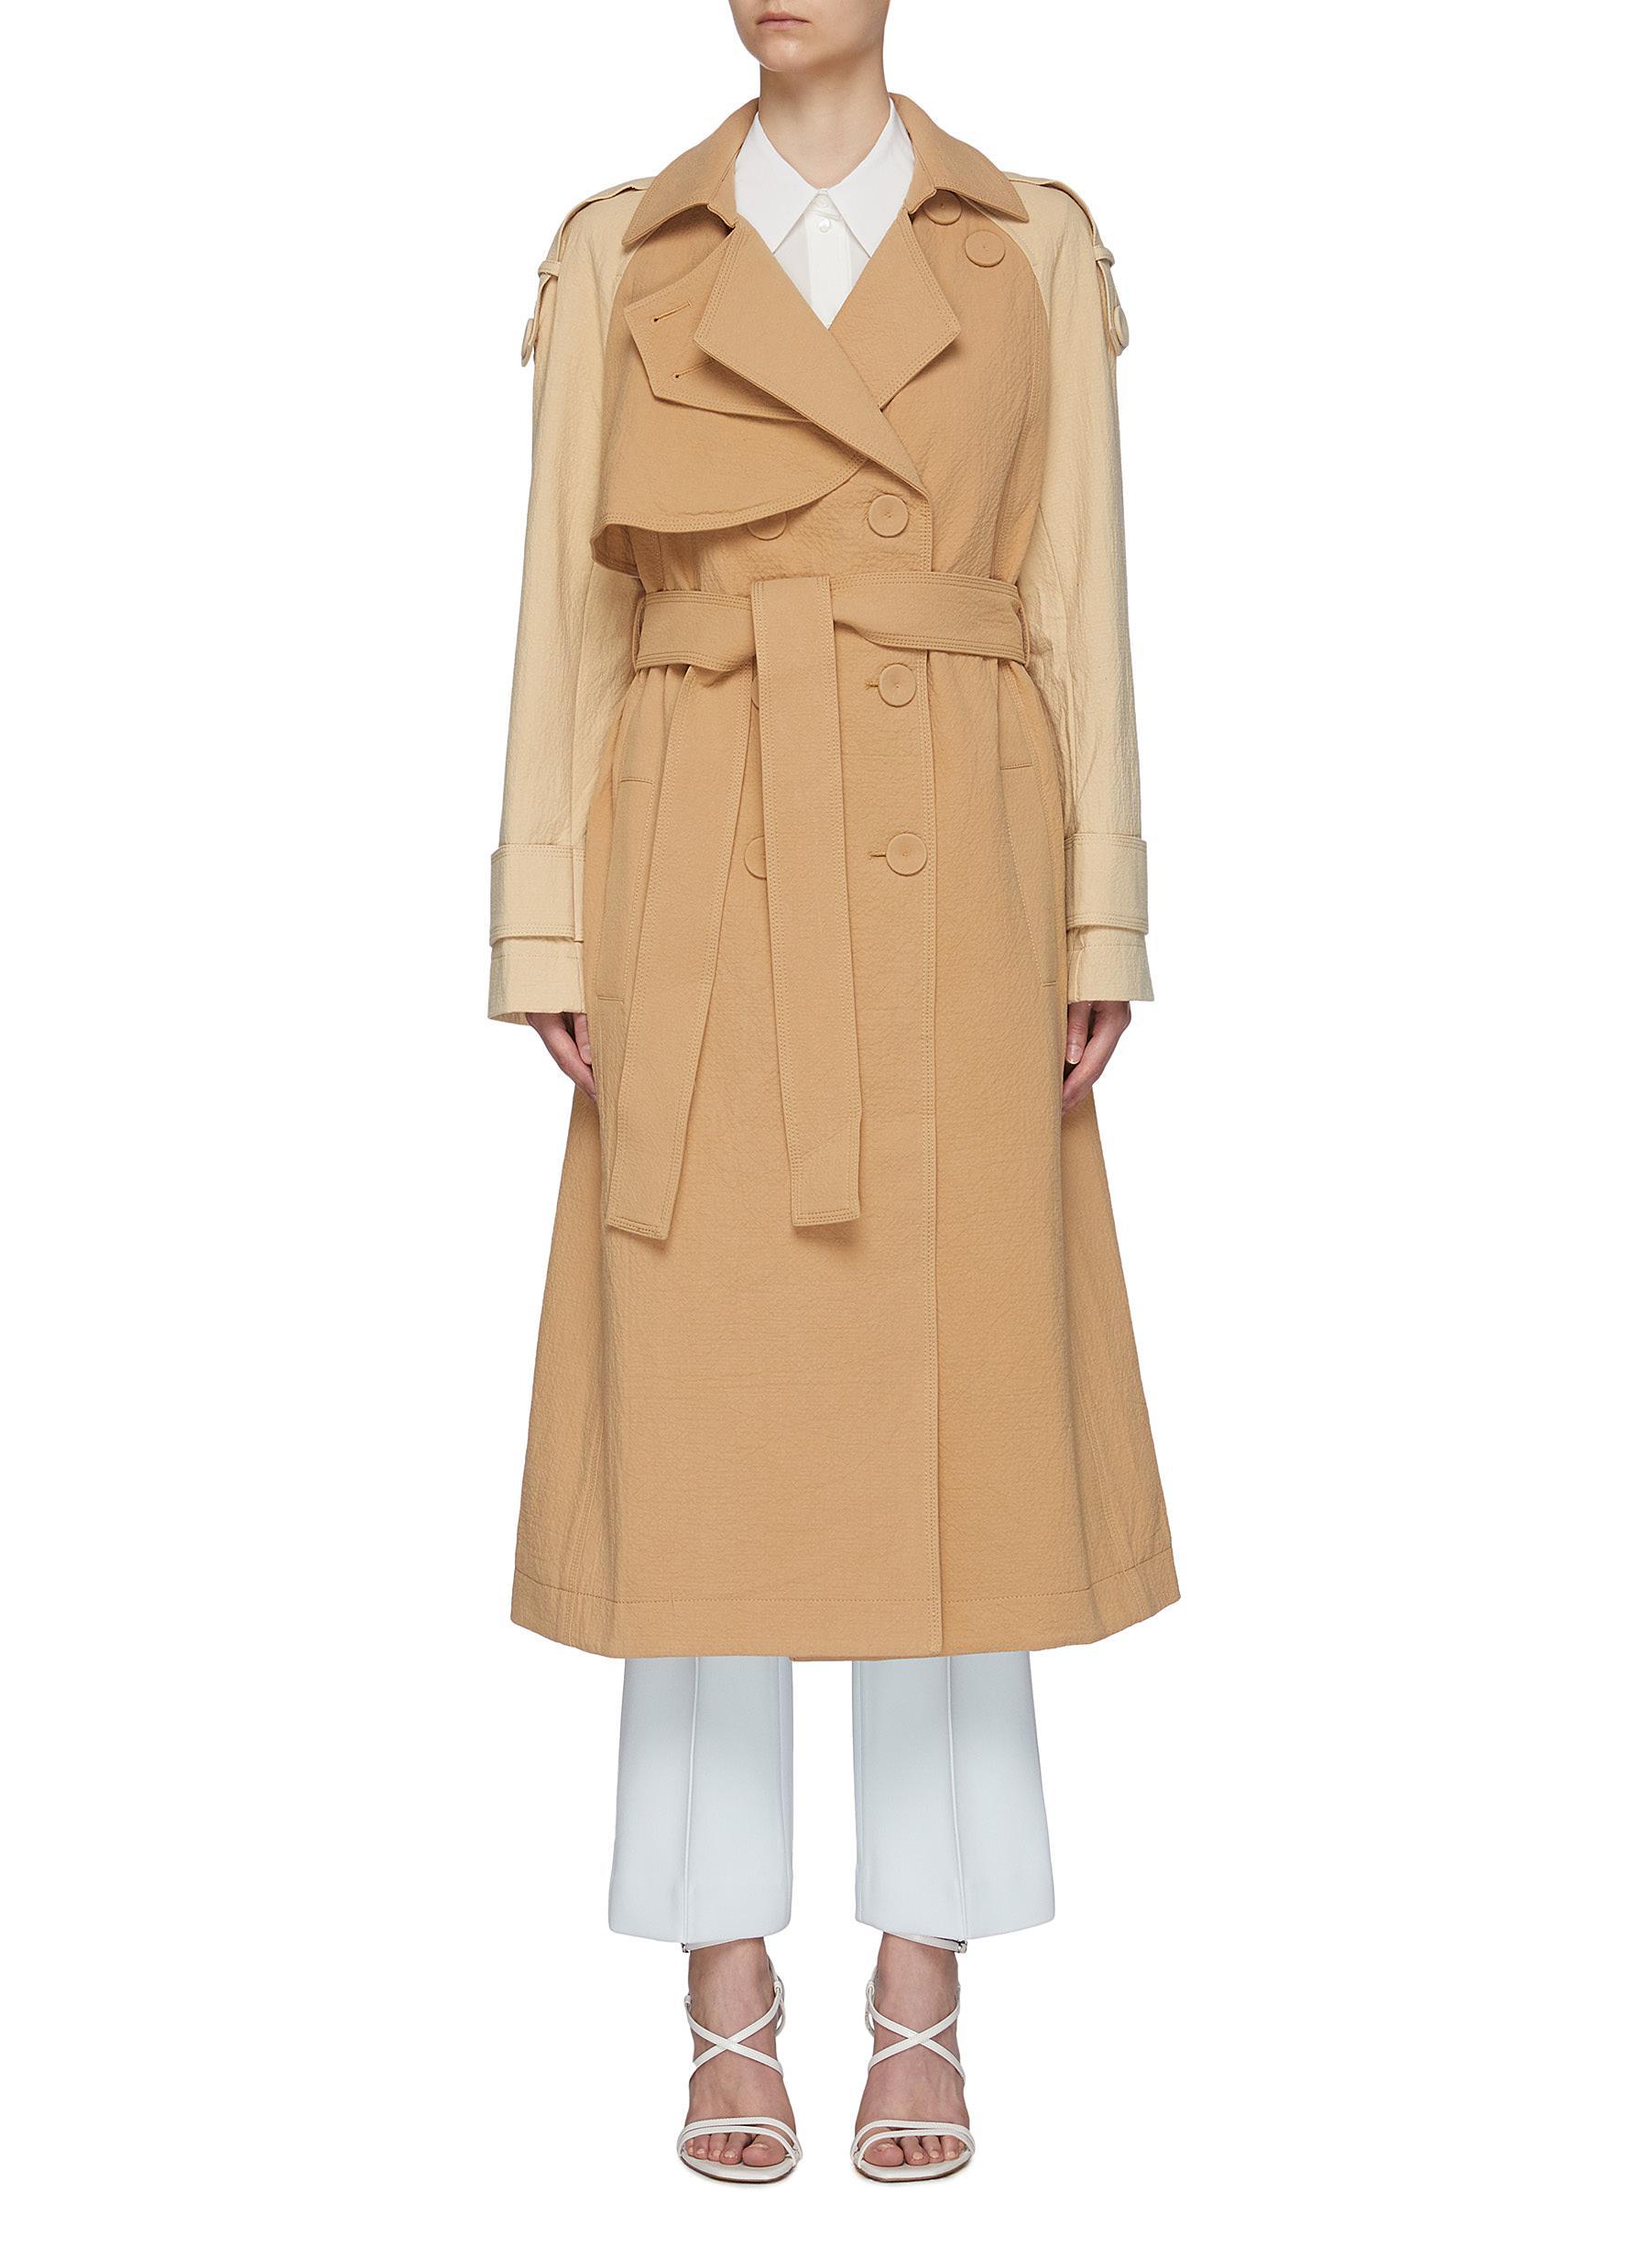 'Newton' Colourblock Cotton Trench Coat